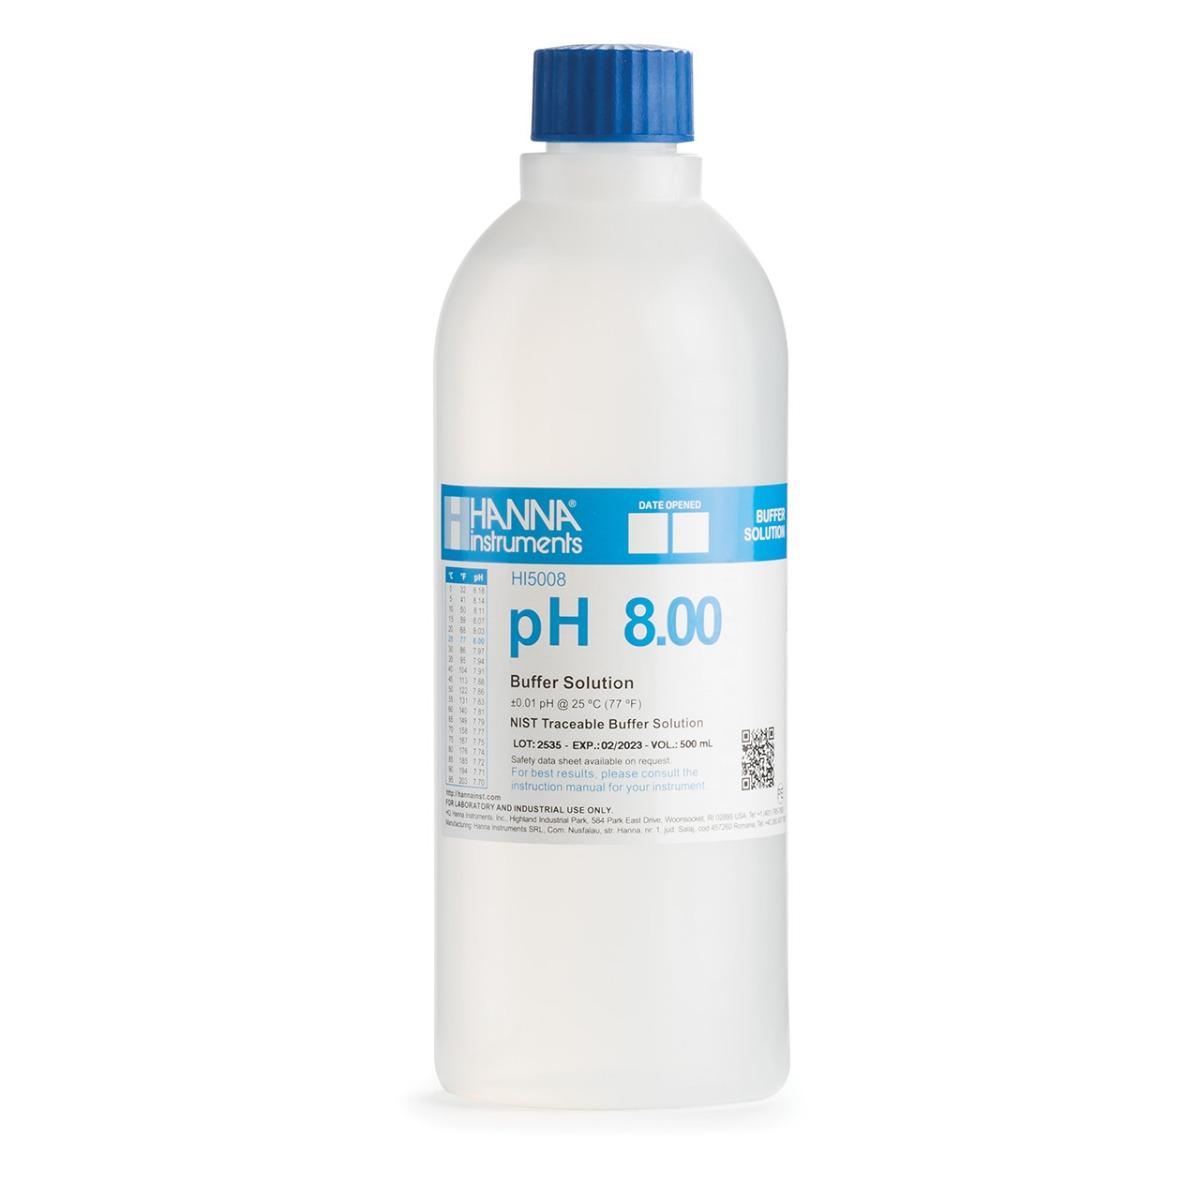 HI5008 pH 8.00 Technical Calibration Buffer (500 mL)